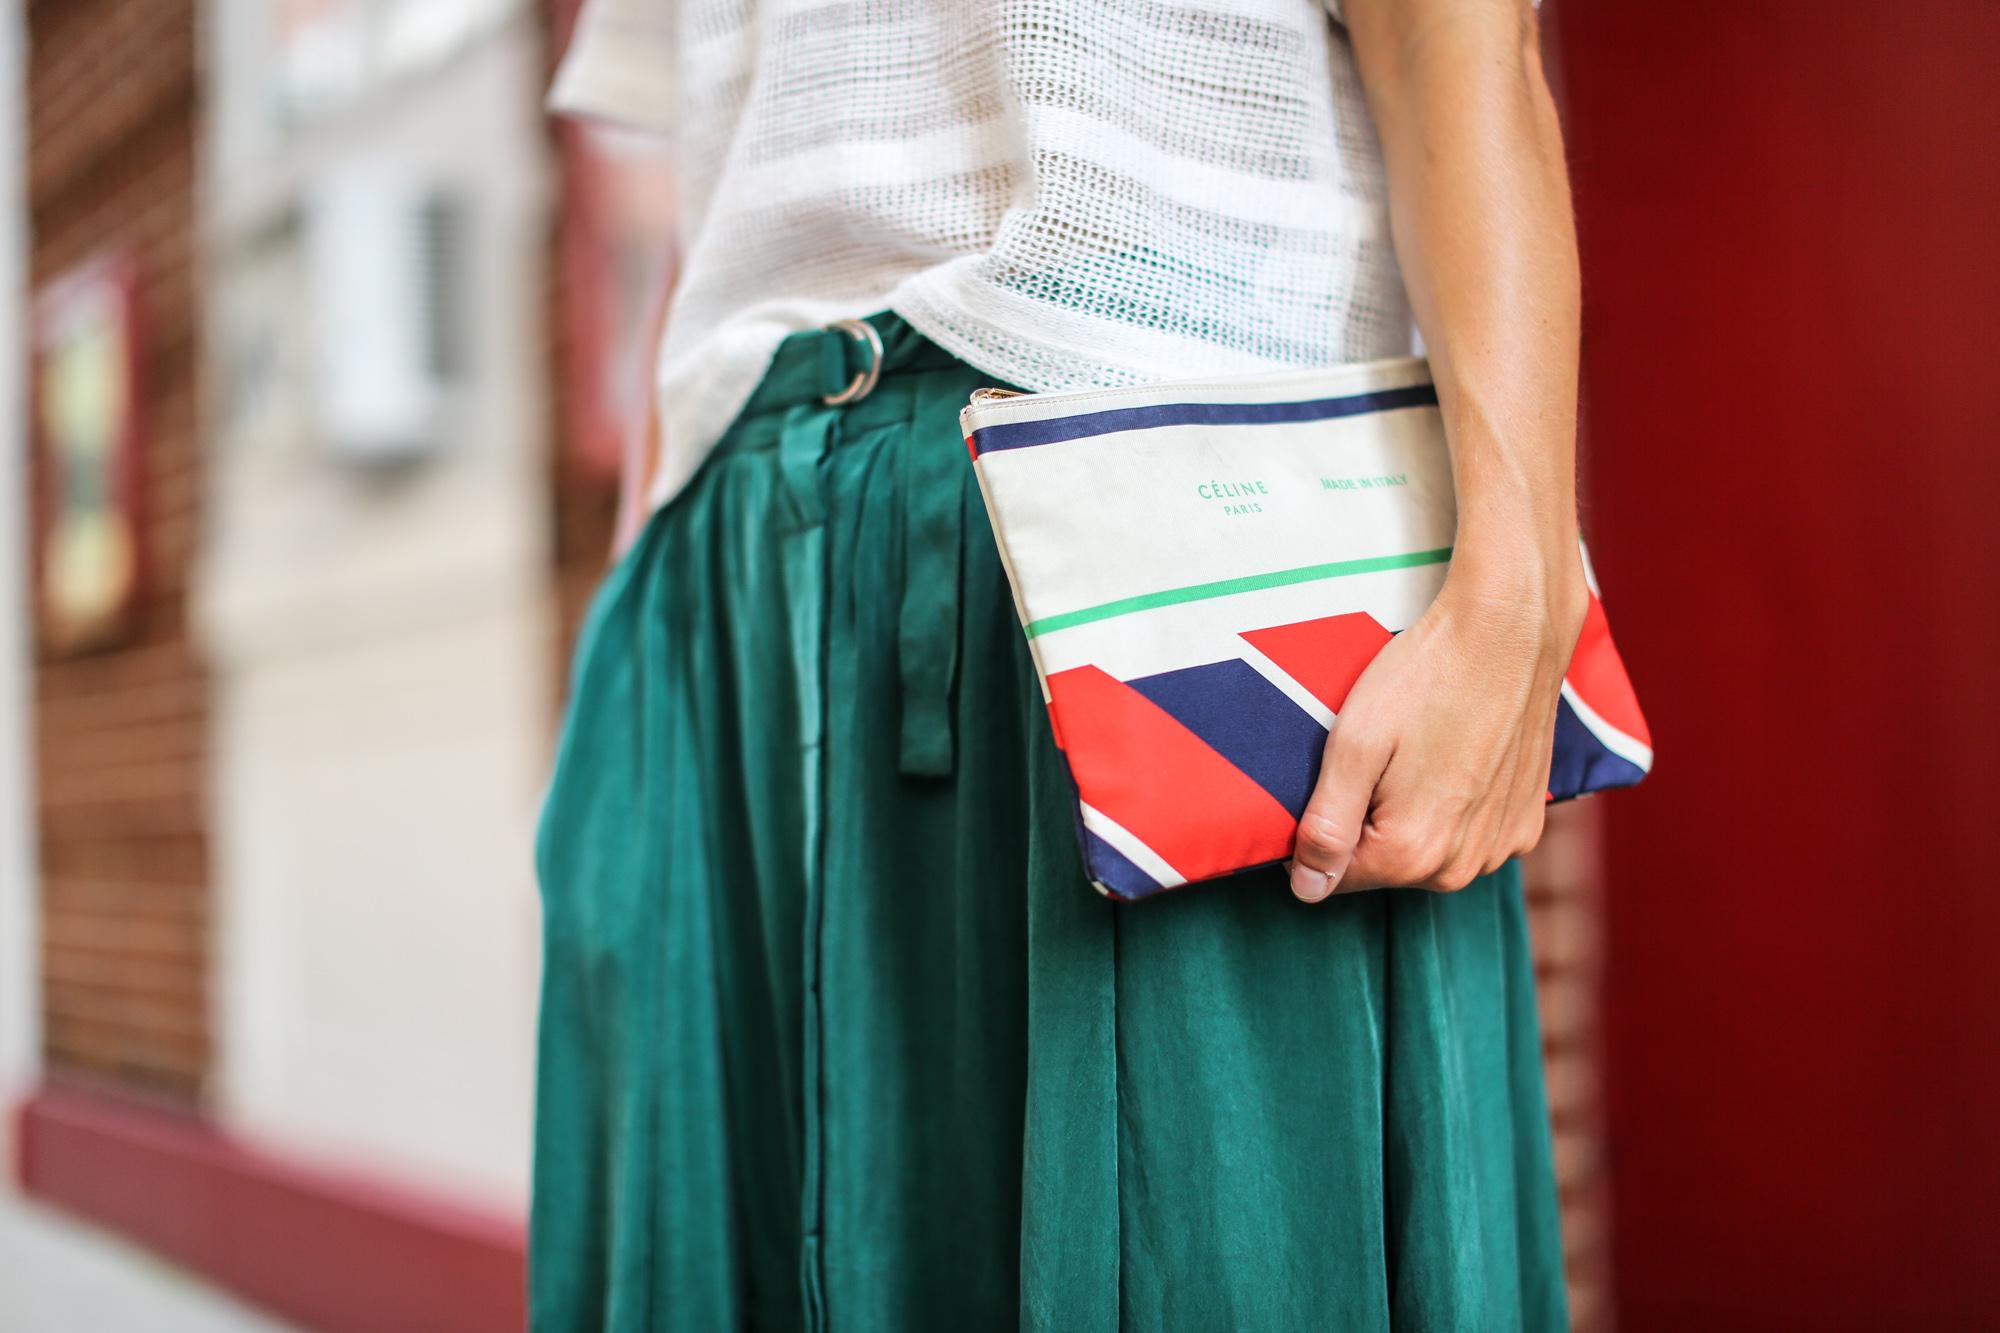 Clochet_streetstyle_newyork_h&m_trend_green_midi_skirt_adidas_stansmith-6